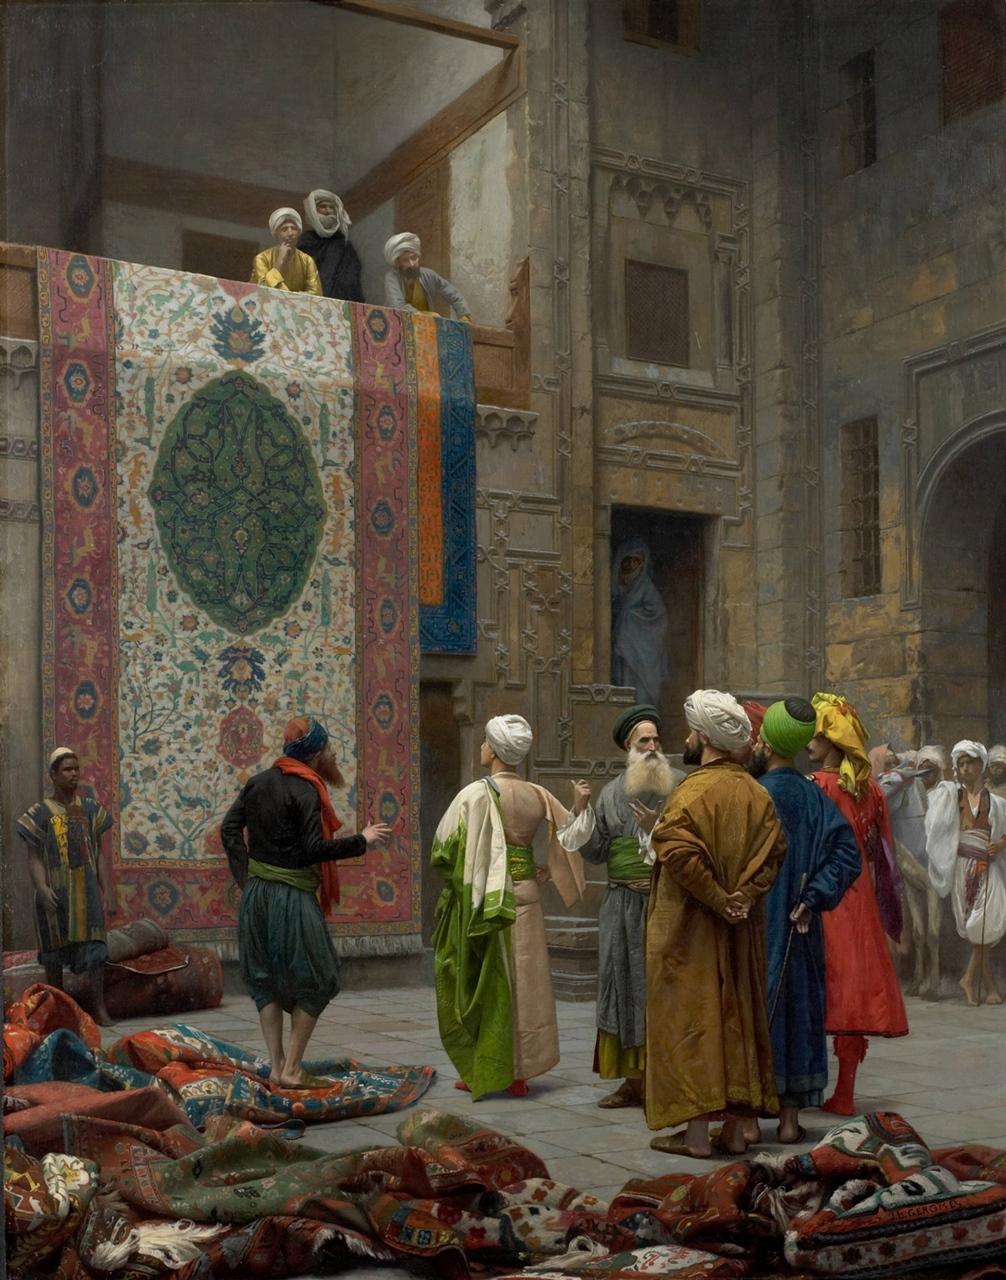 El mercader de alfombras. Jean-Léon Gérôme. Óleo sobre lienzo, 1887